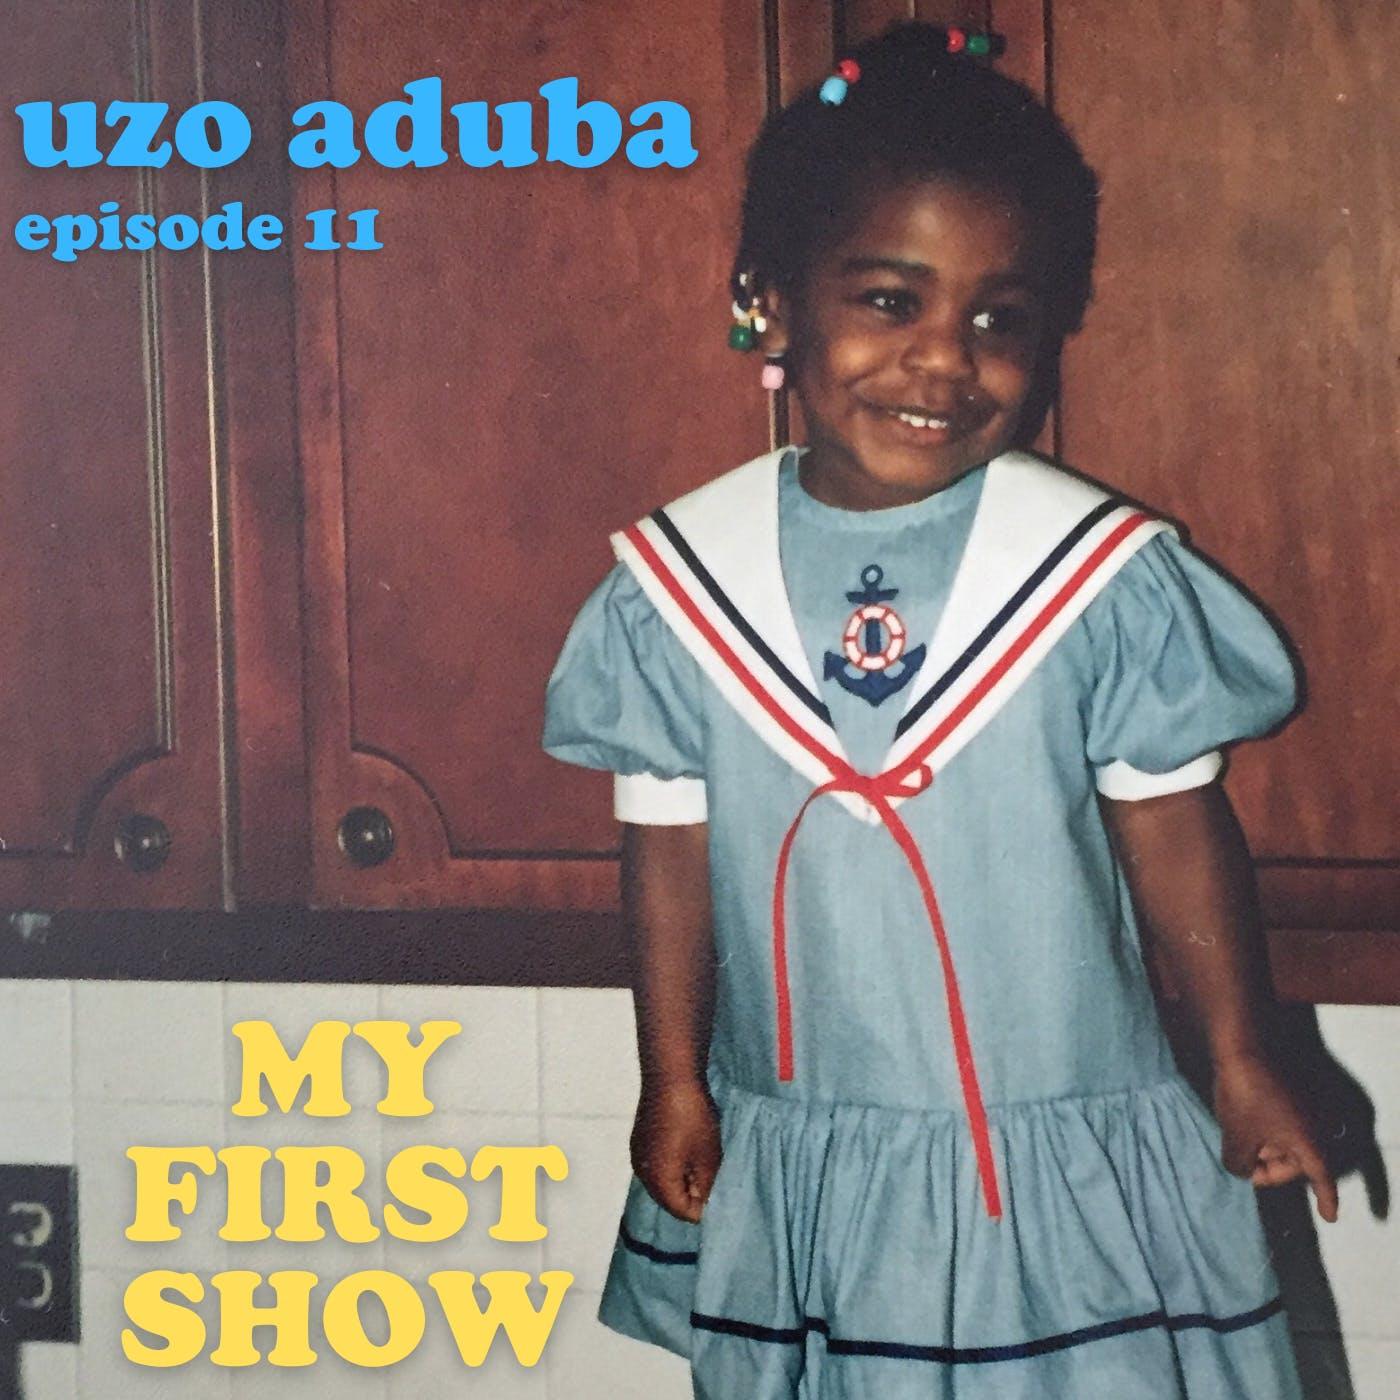 S1/Ep11: Uzo Aduba